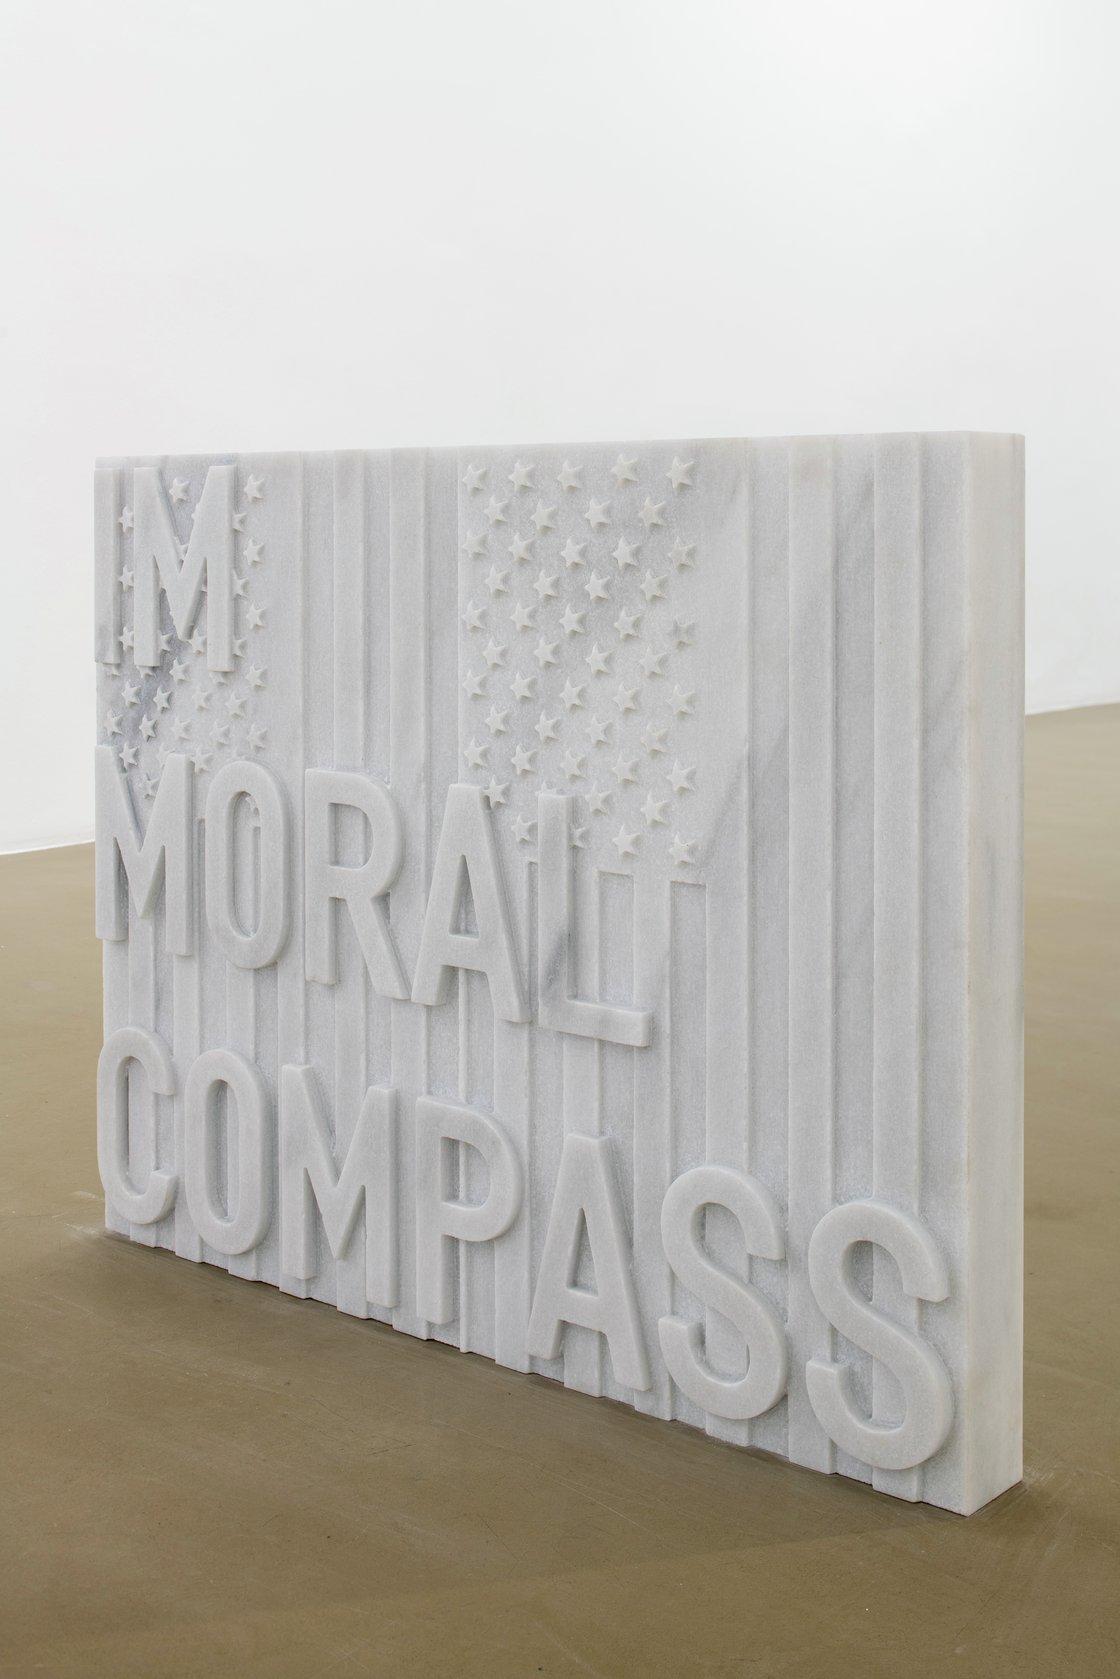 Rirkrit Tiravanija, untitled 2020 (im moral compass) (flags, 1987), 2020